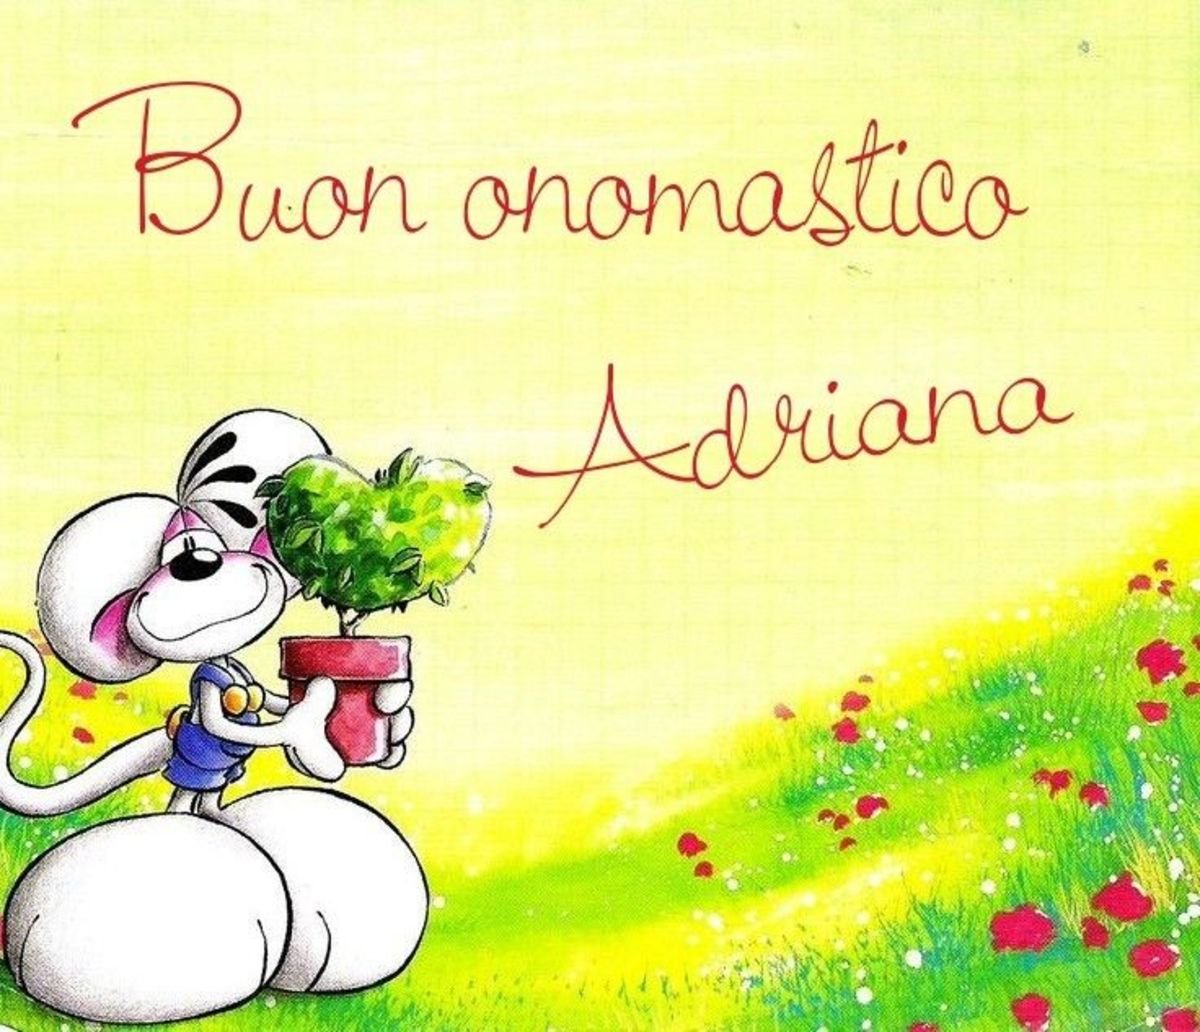 Buon Onomastico Adriana